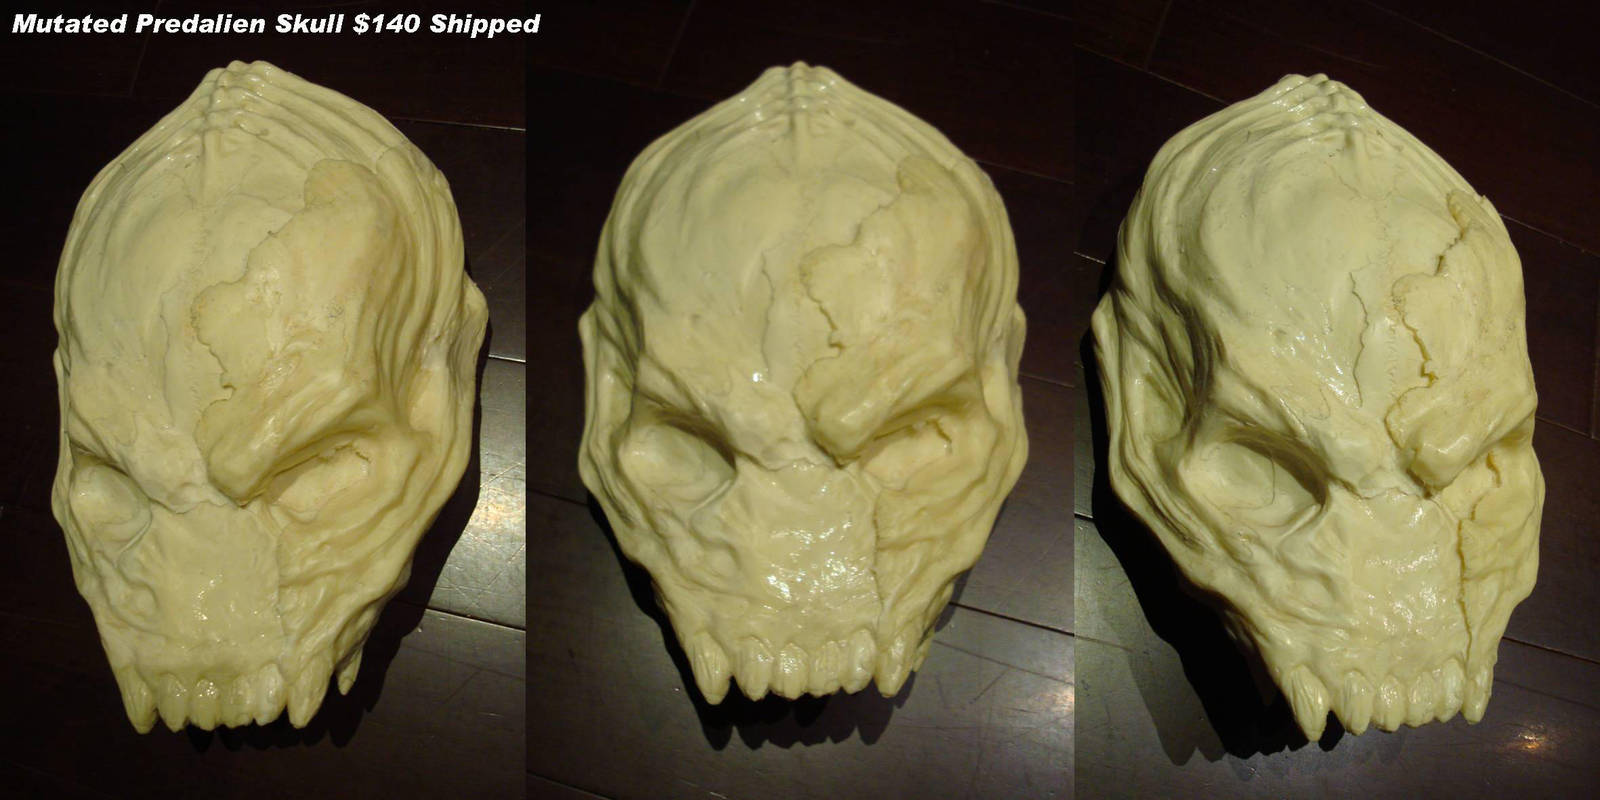 Mutant predalien skull by uratz studios on deviantart - Uratz studios ...